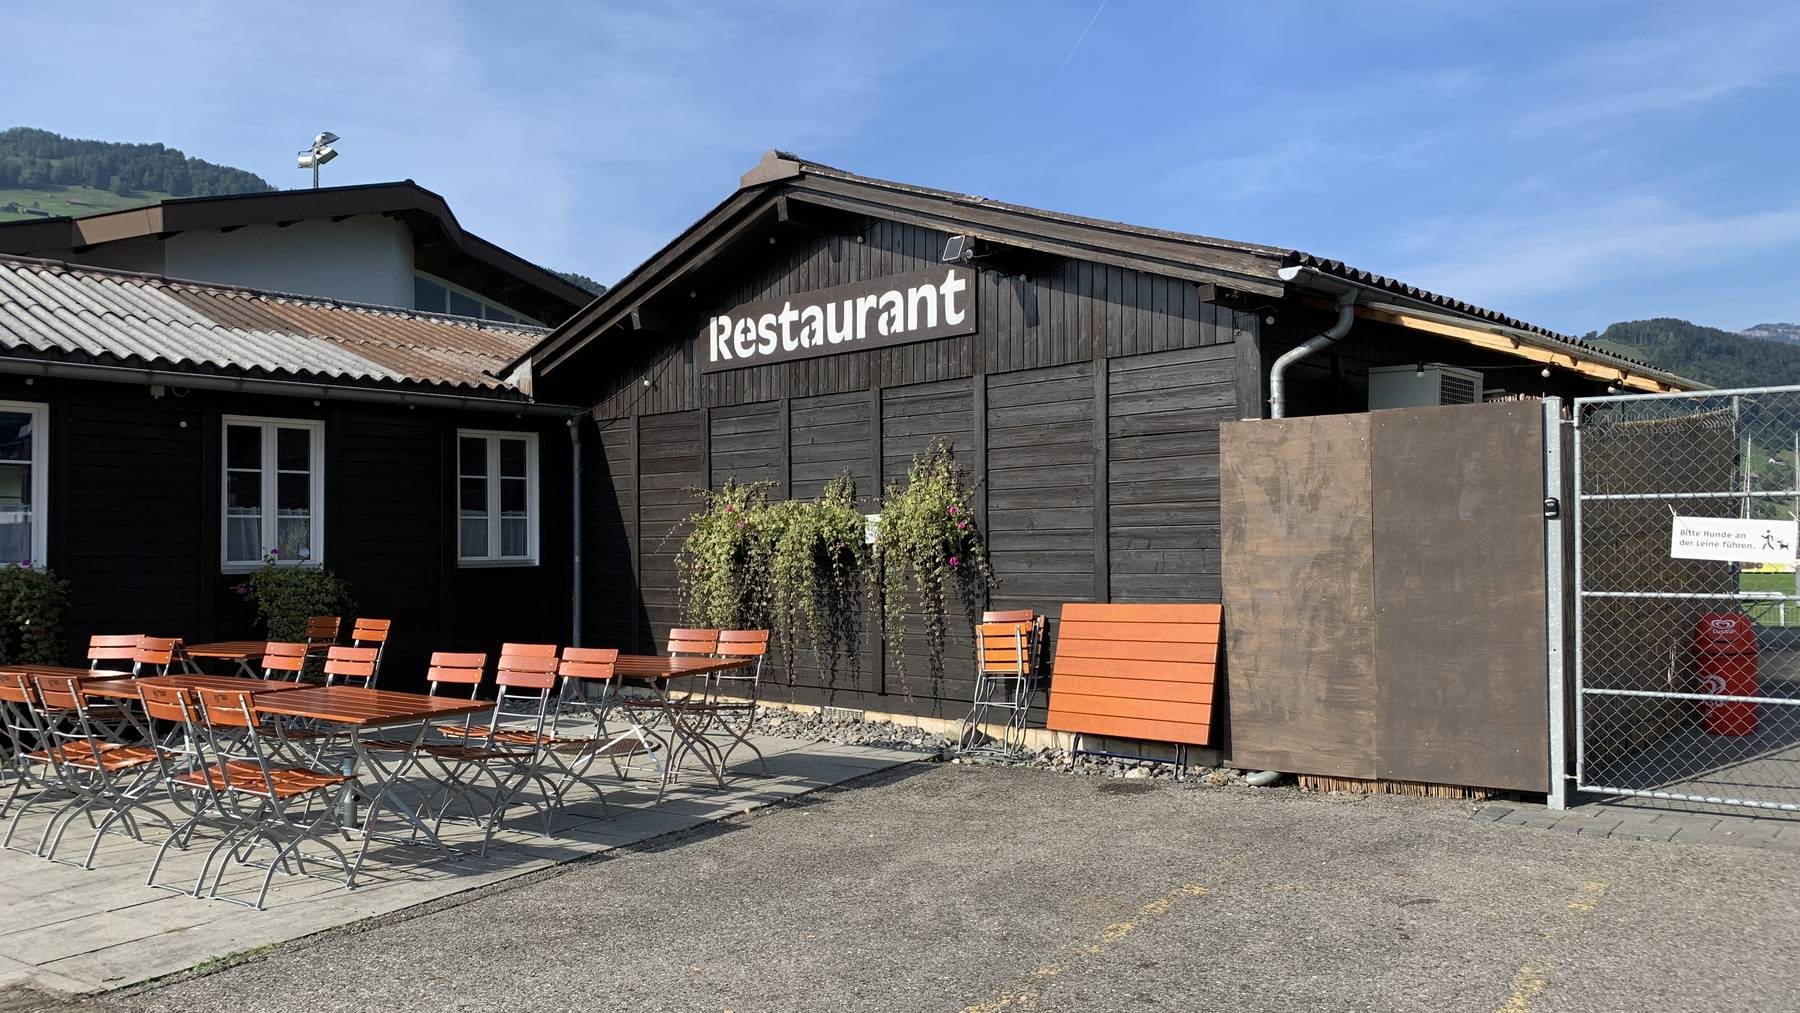 Clublokal des SC Buochs, Chalet Seefeld